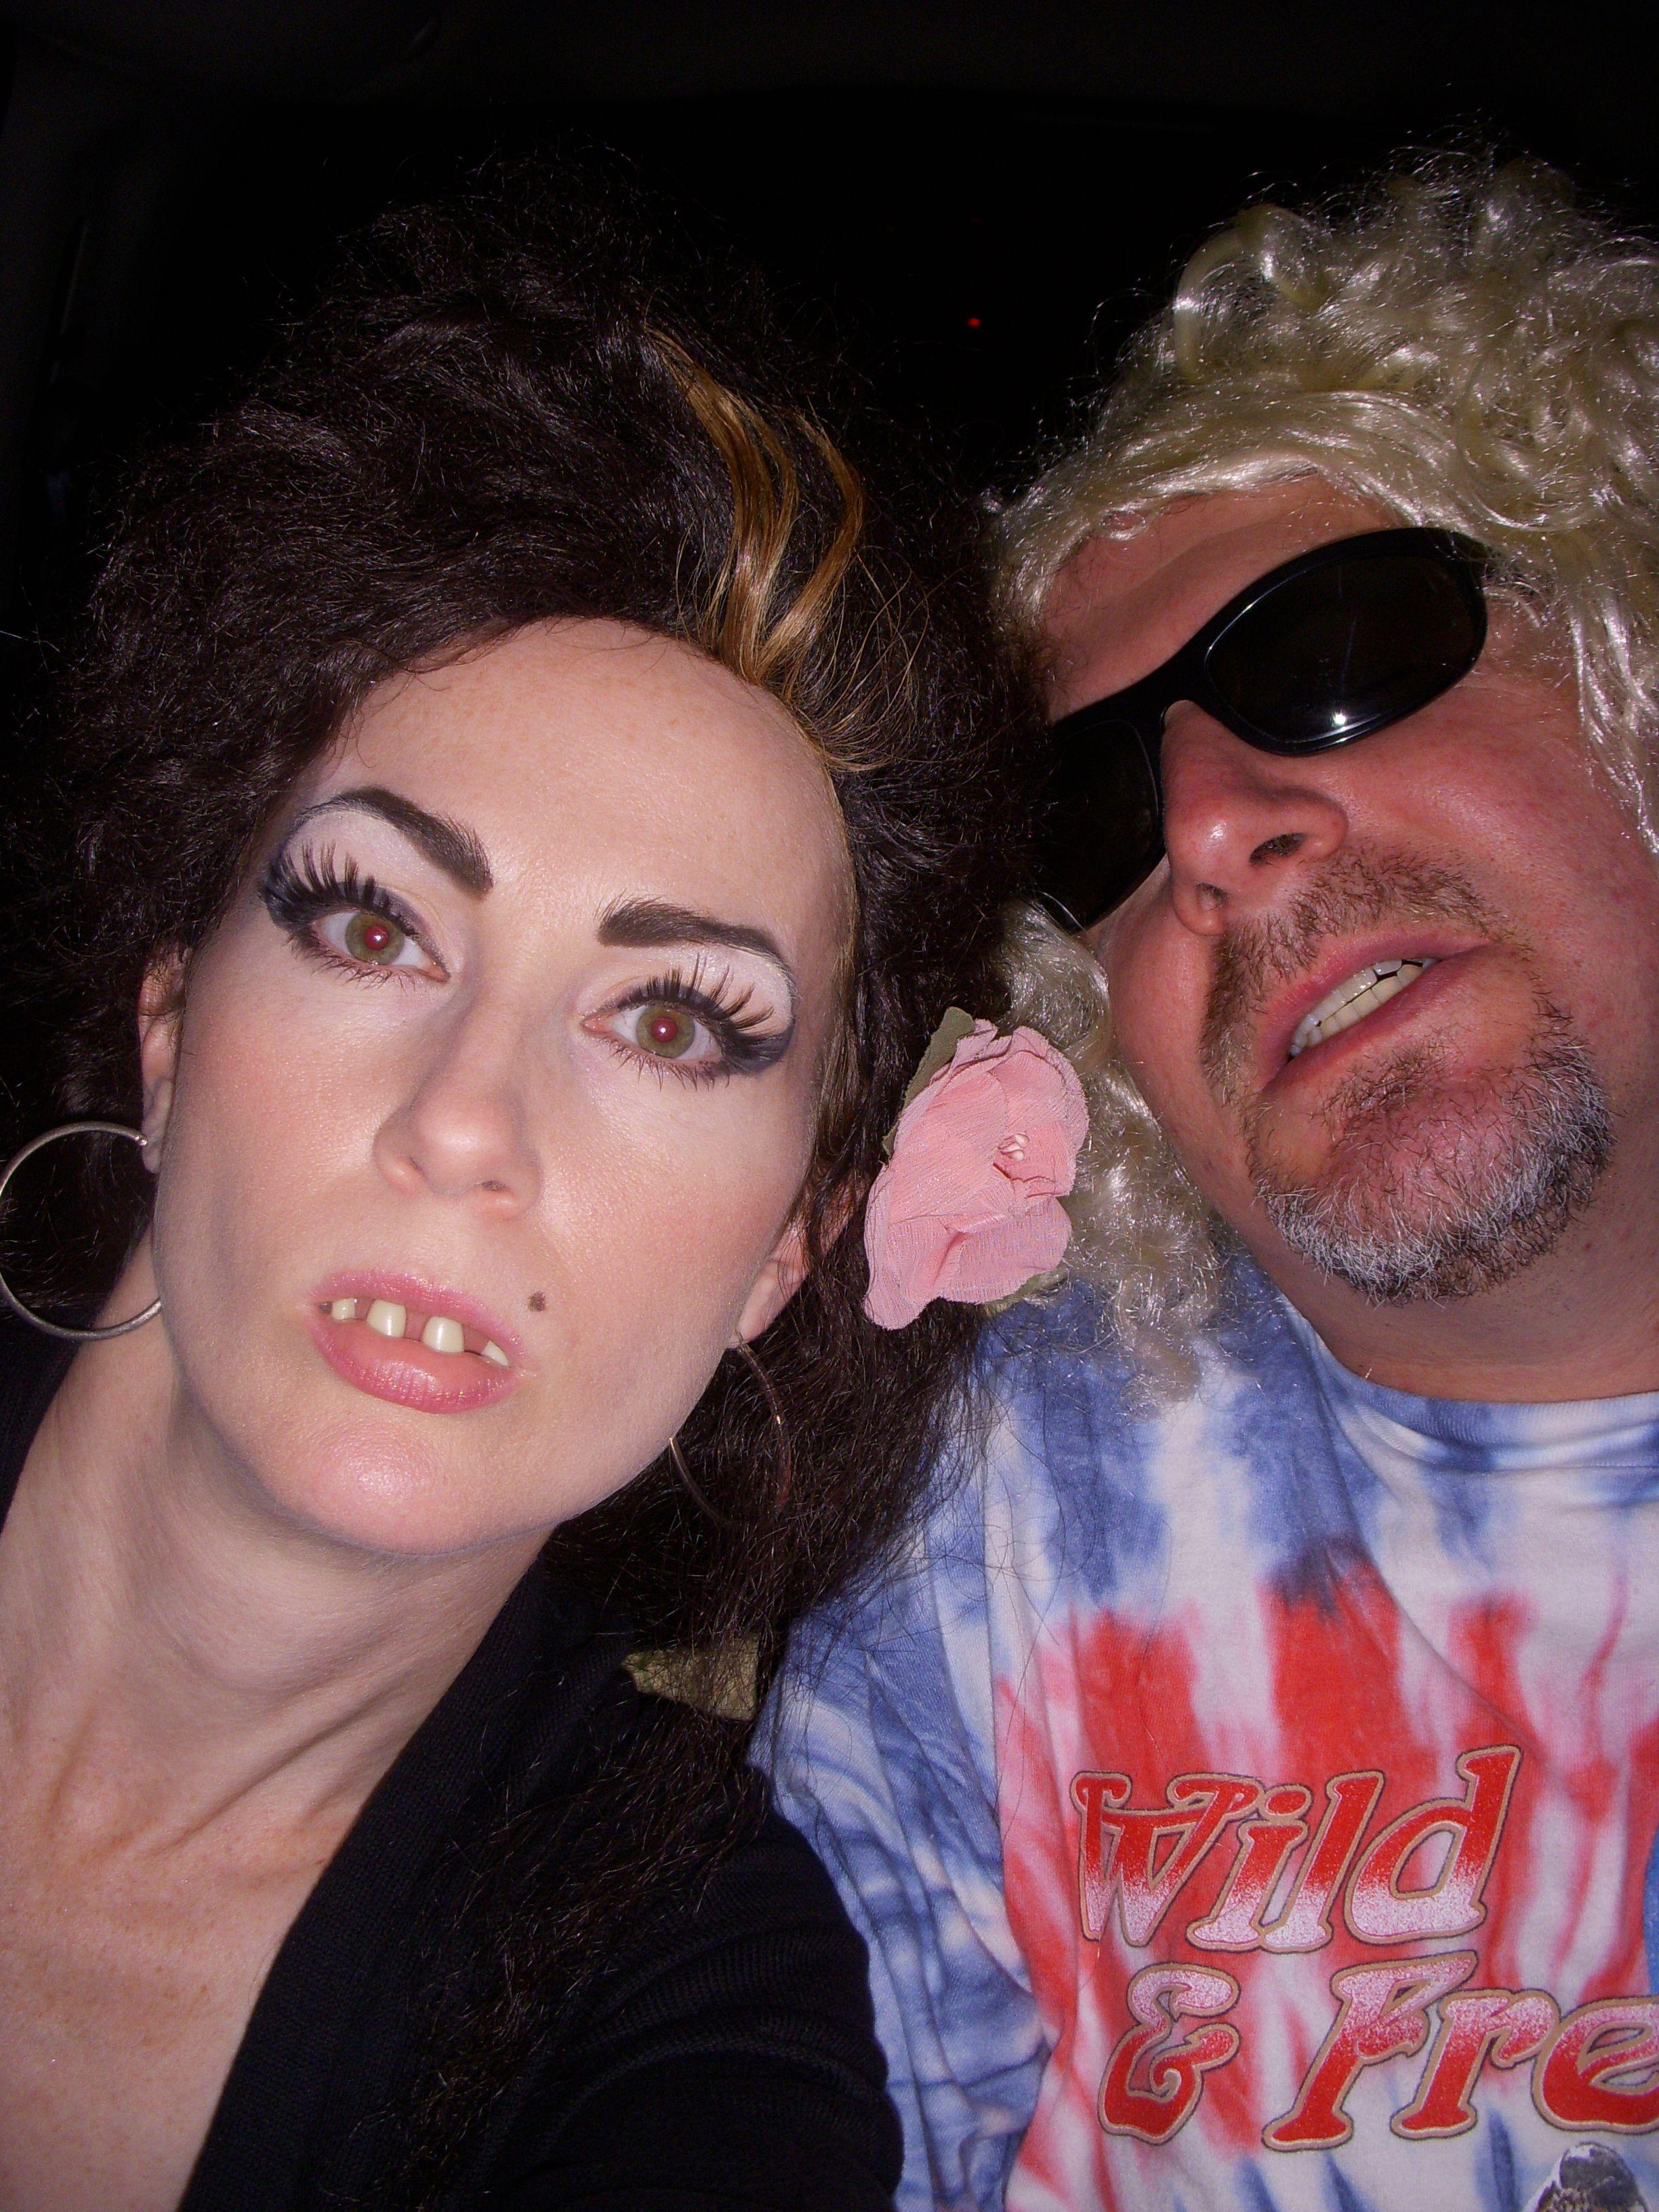 Amy Winehouse And Sammy Hagar Halloween Costumes 2009 Couples Costumes Red Rocker Amy Winehouse